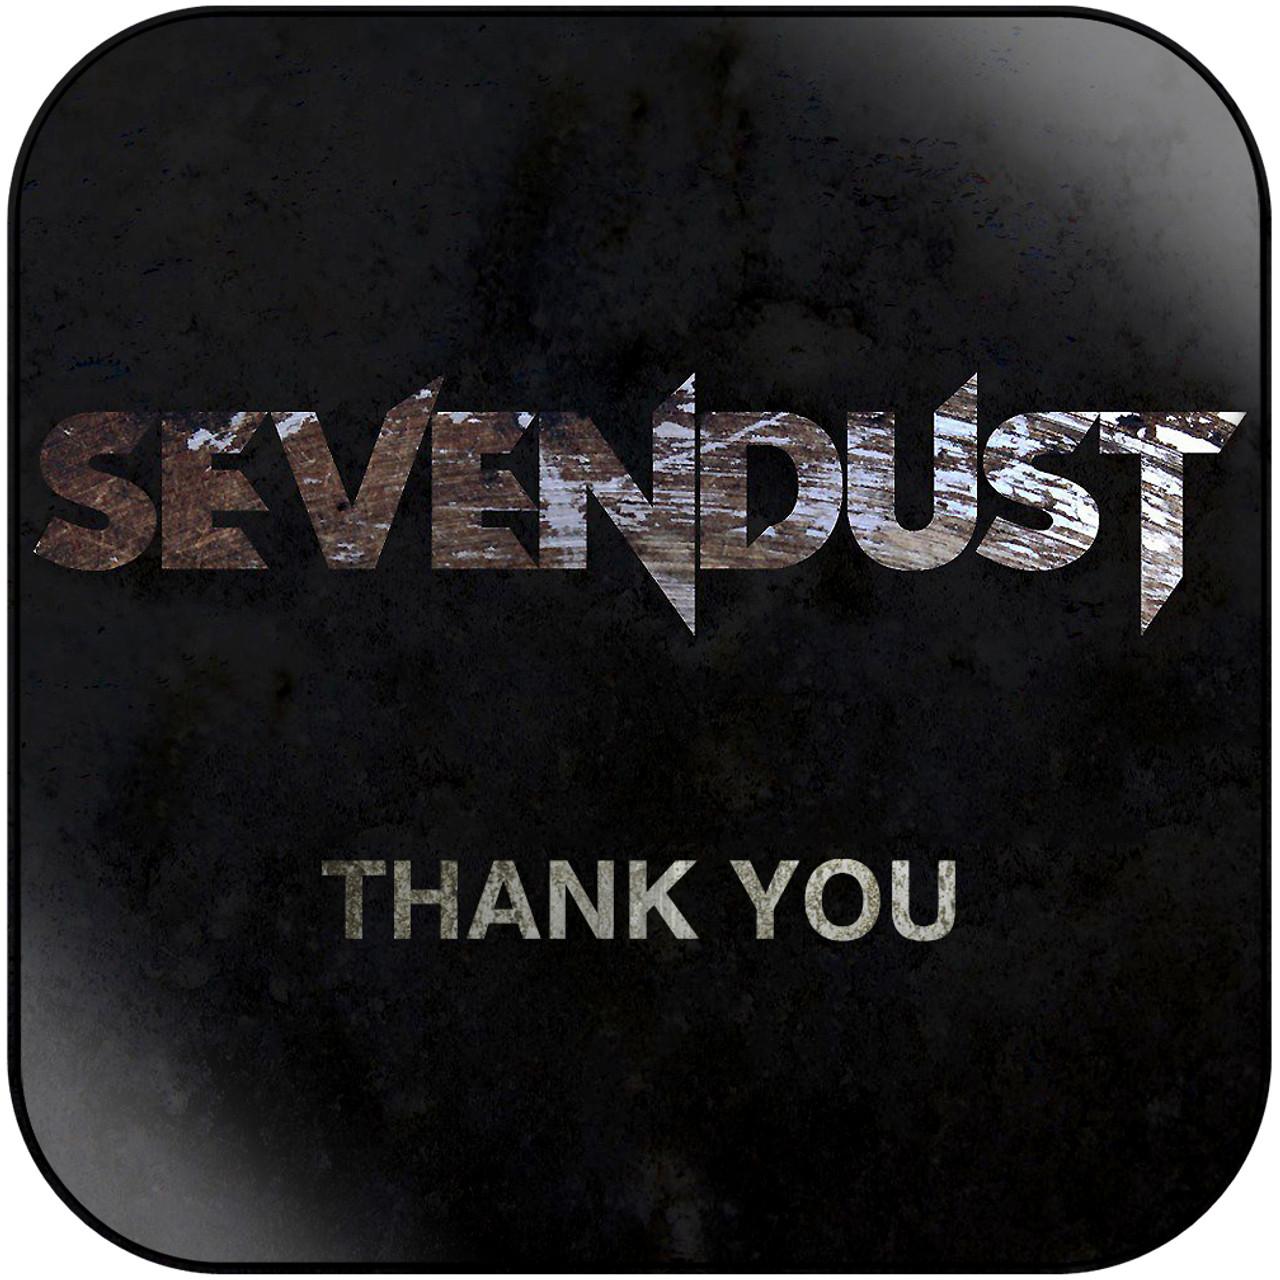 Sevendust - Thank You Album Cover Sticker